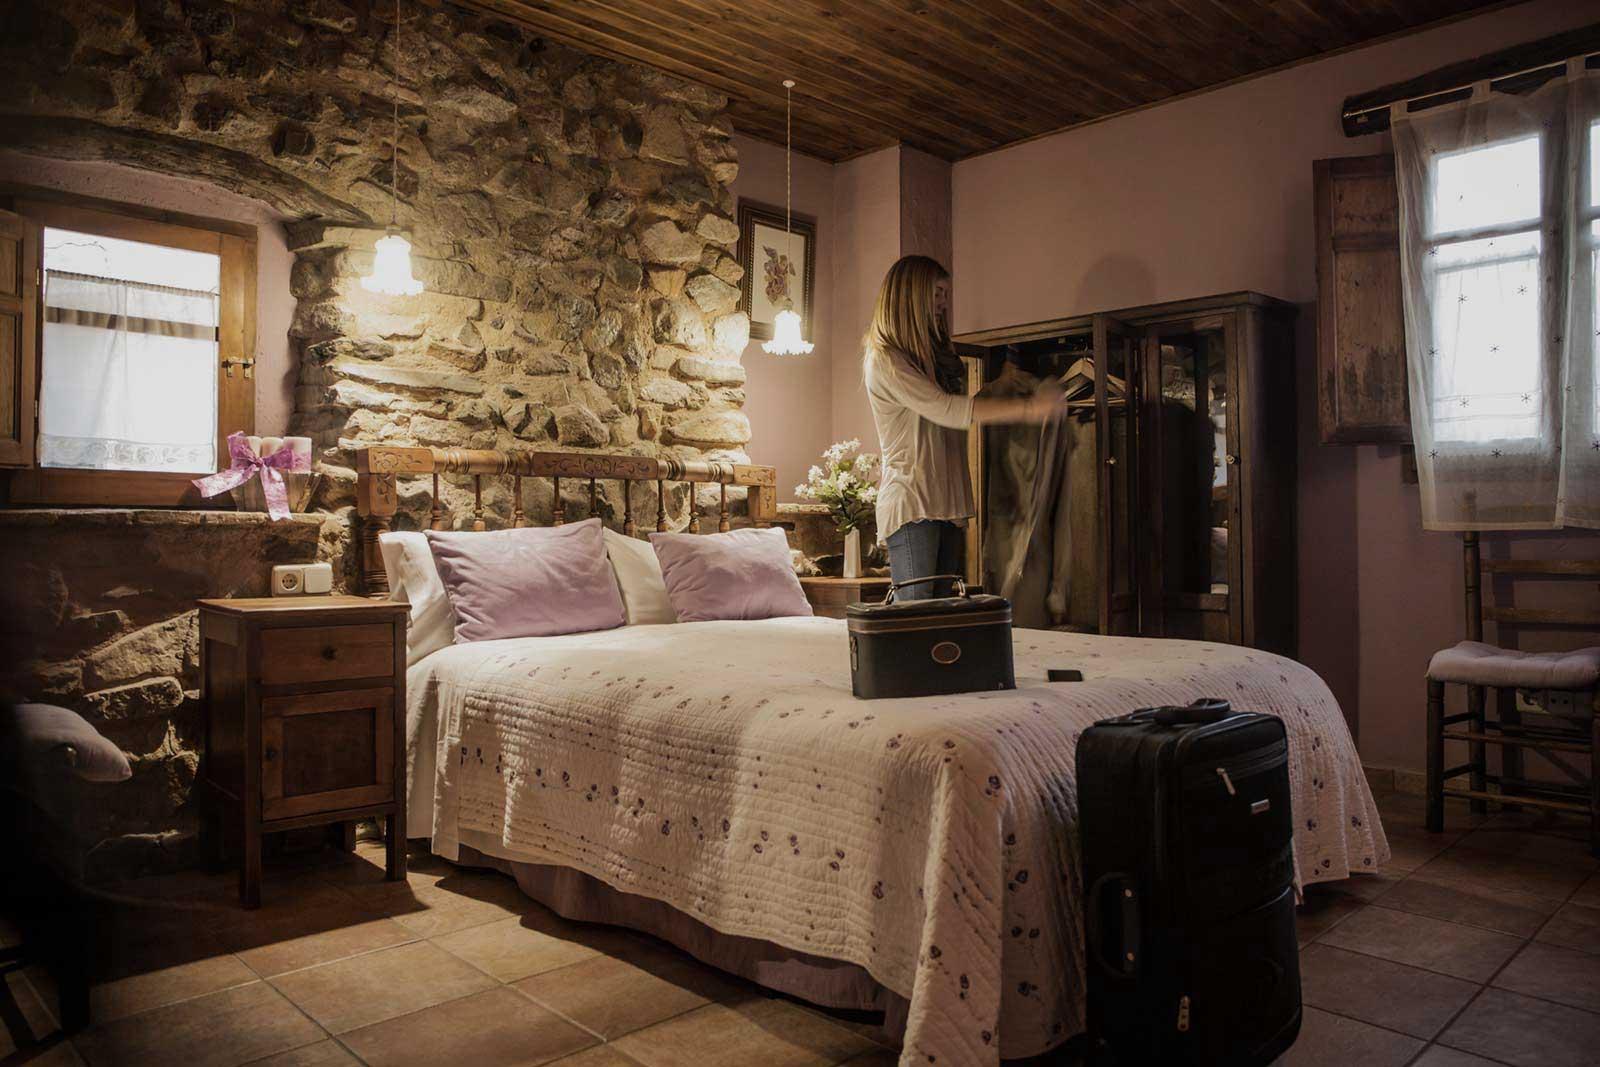 Malva room